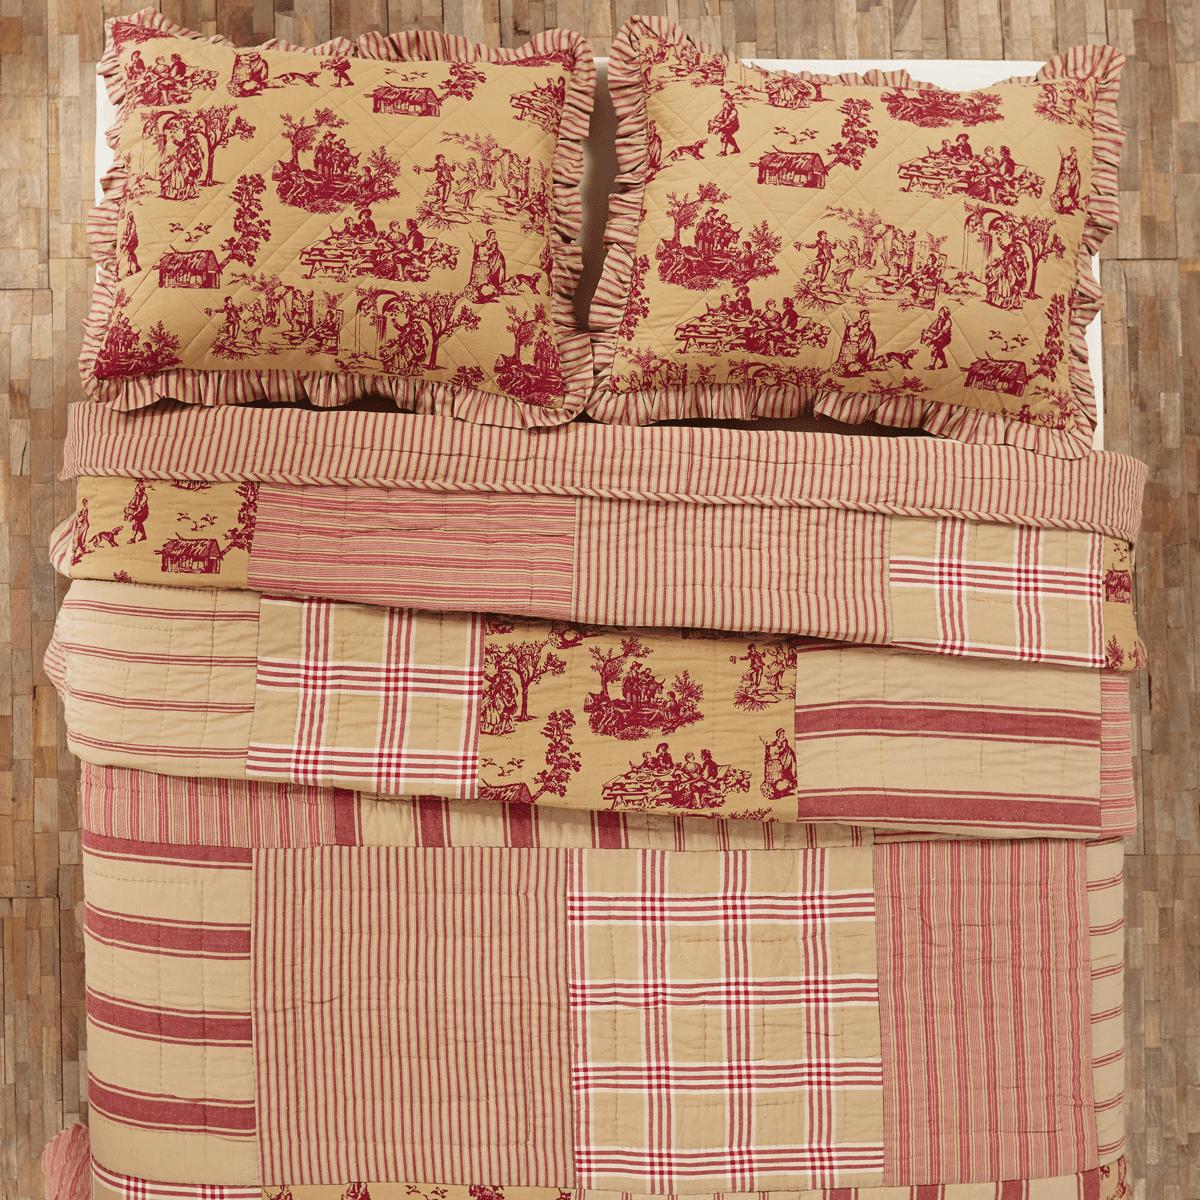 Elaine Rouge Twin Patchwork Quilt 86x68 - Walmart.com : patchwork quilt twin - Adamdwight.com